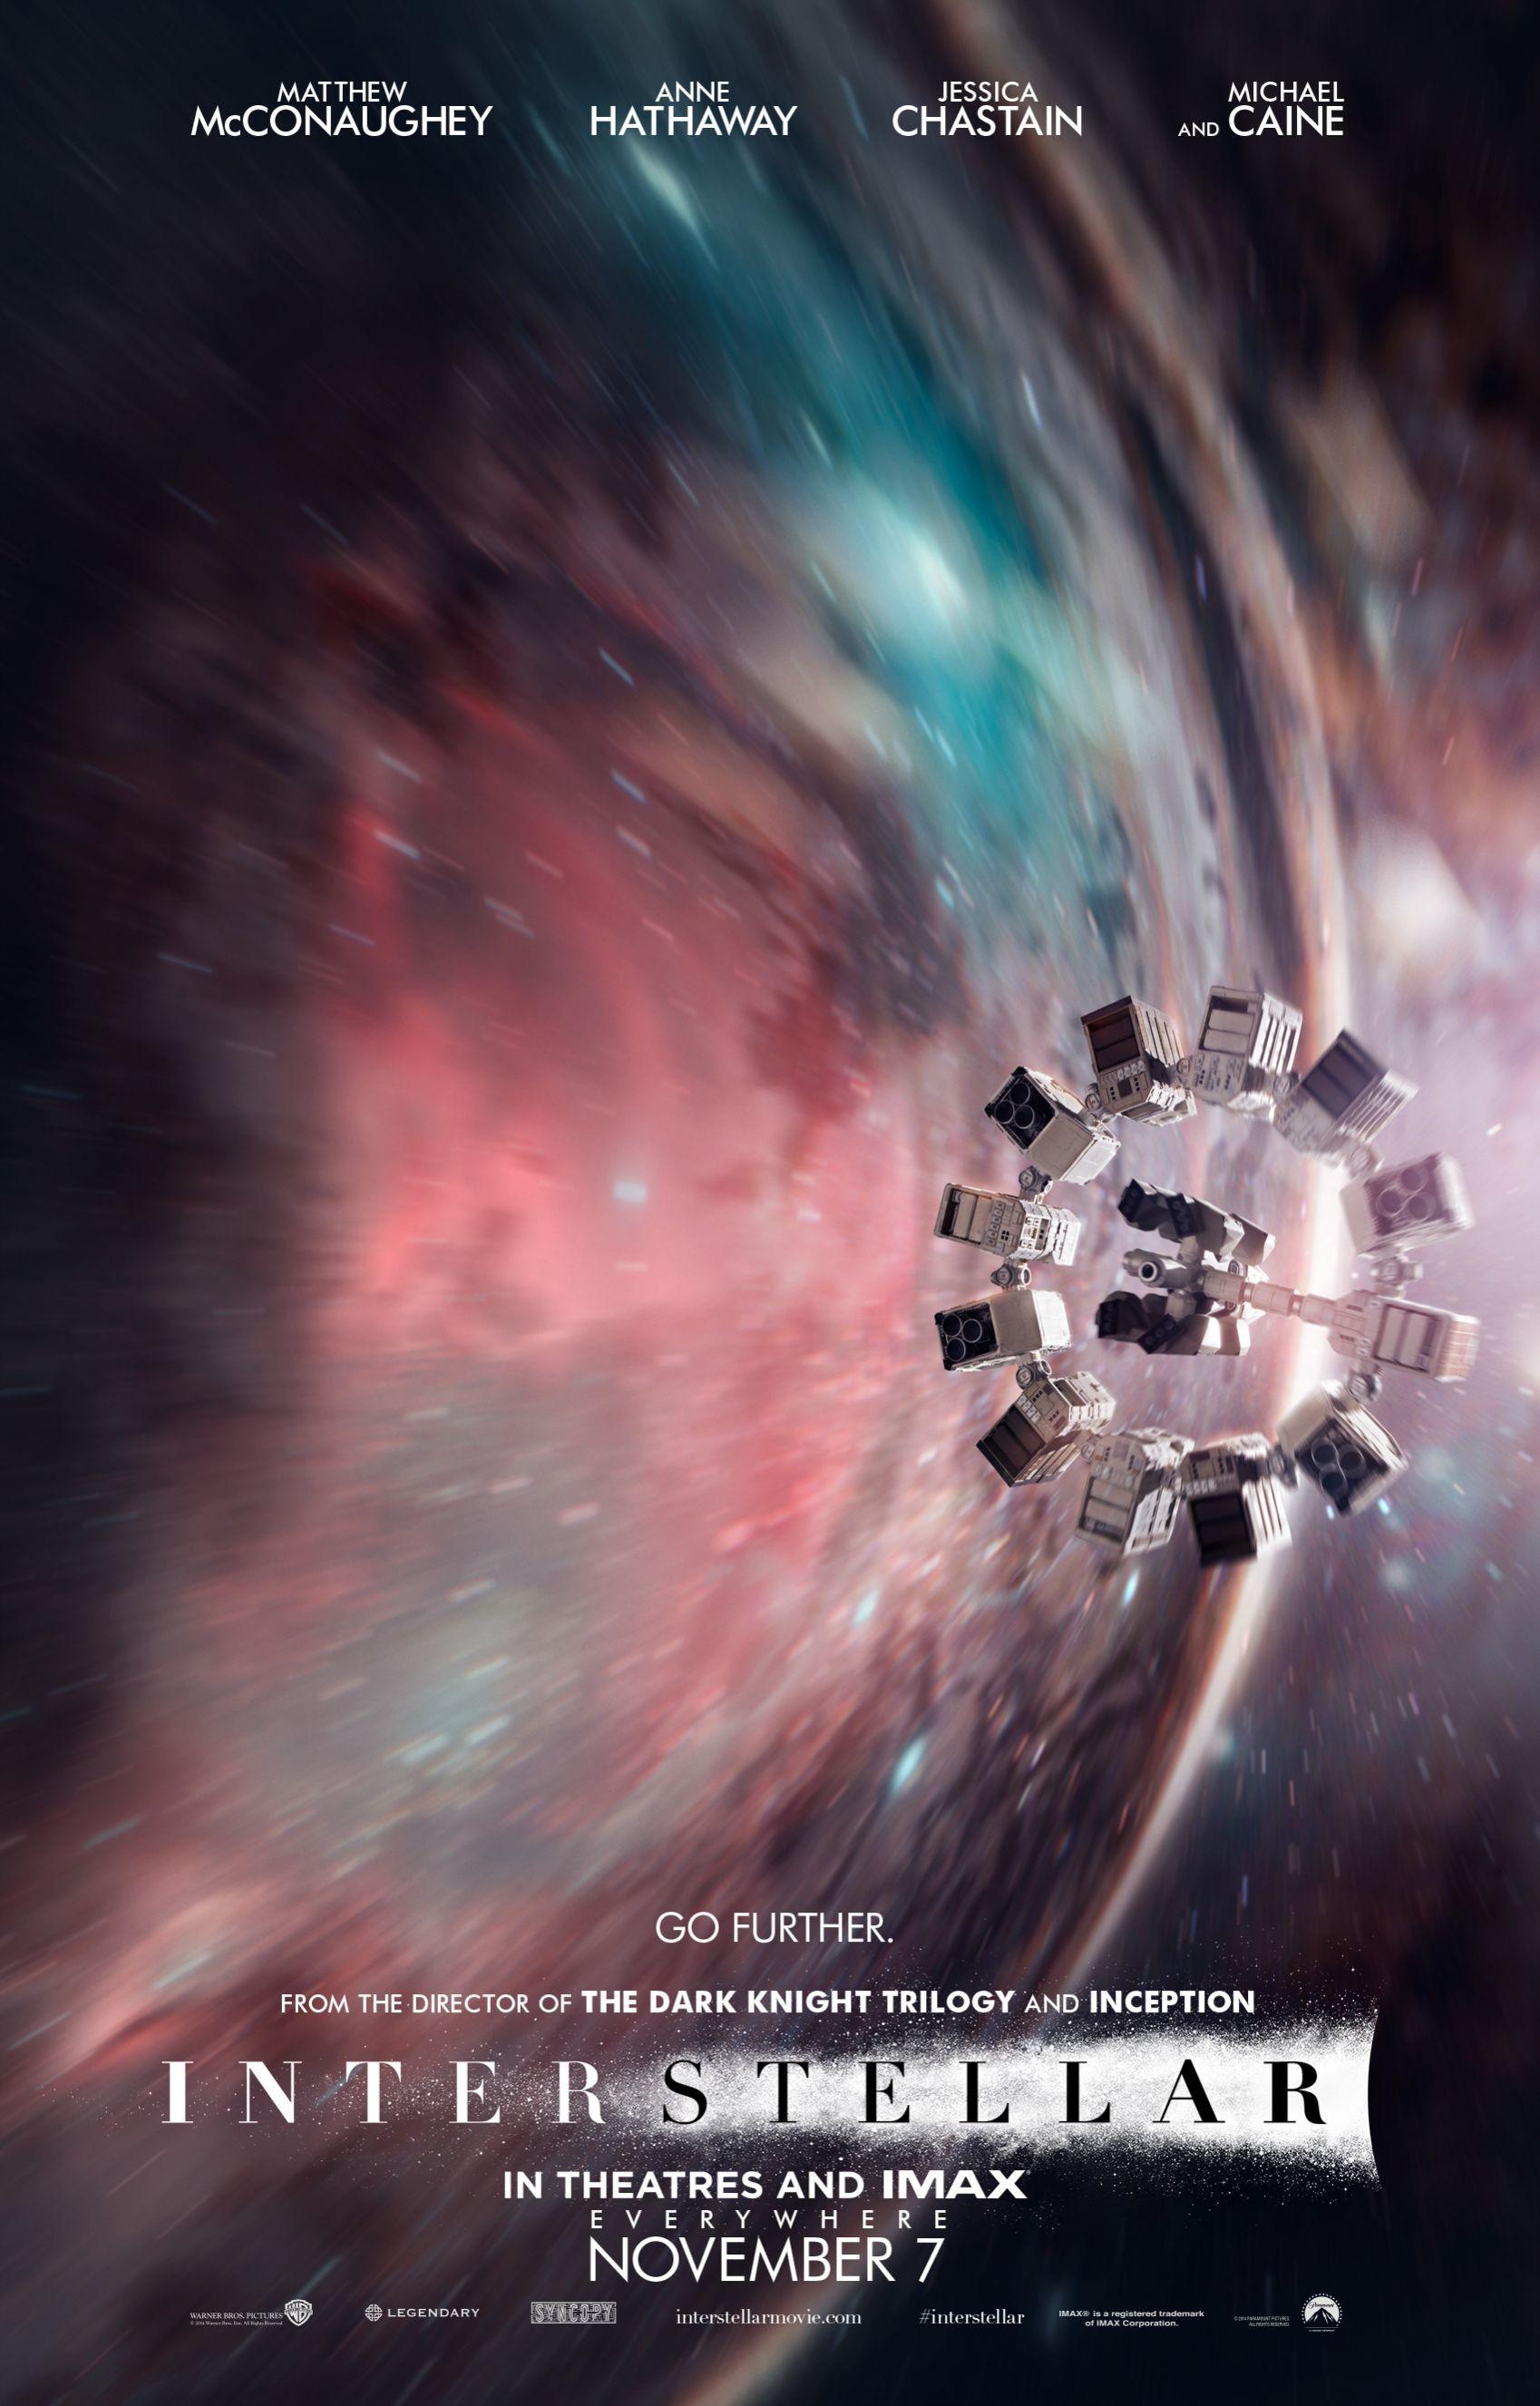 New Interstellar Poster Interstellar Movie And Films - Beautifully designed interstellar posters james fletcher